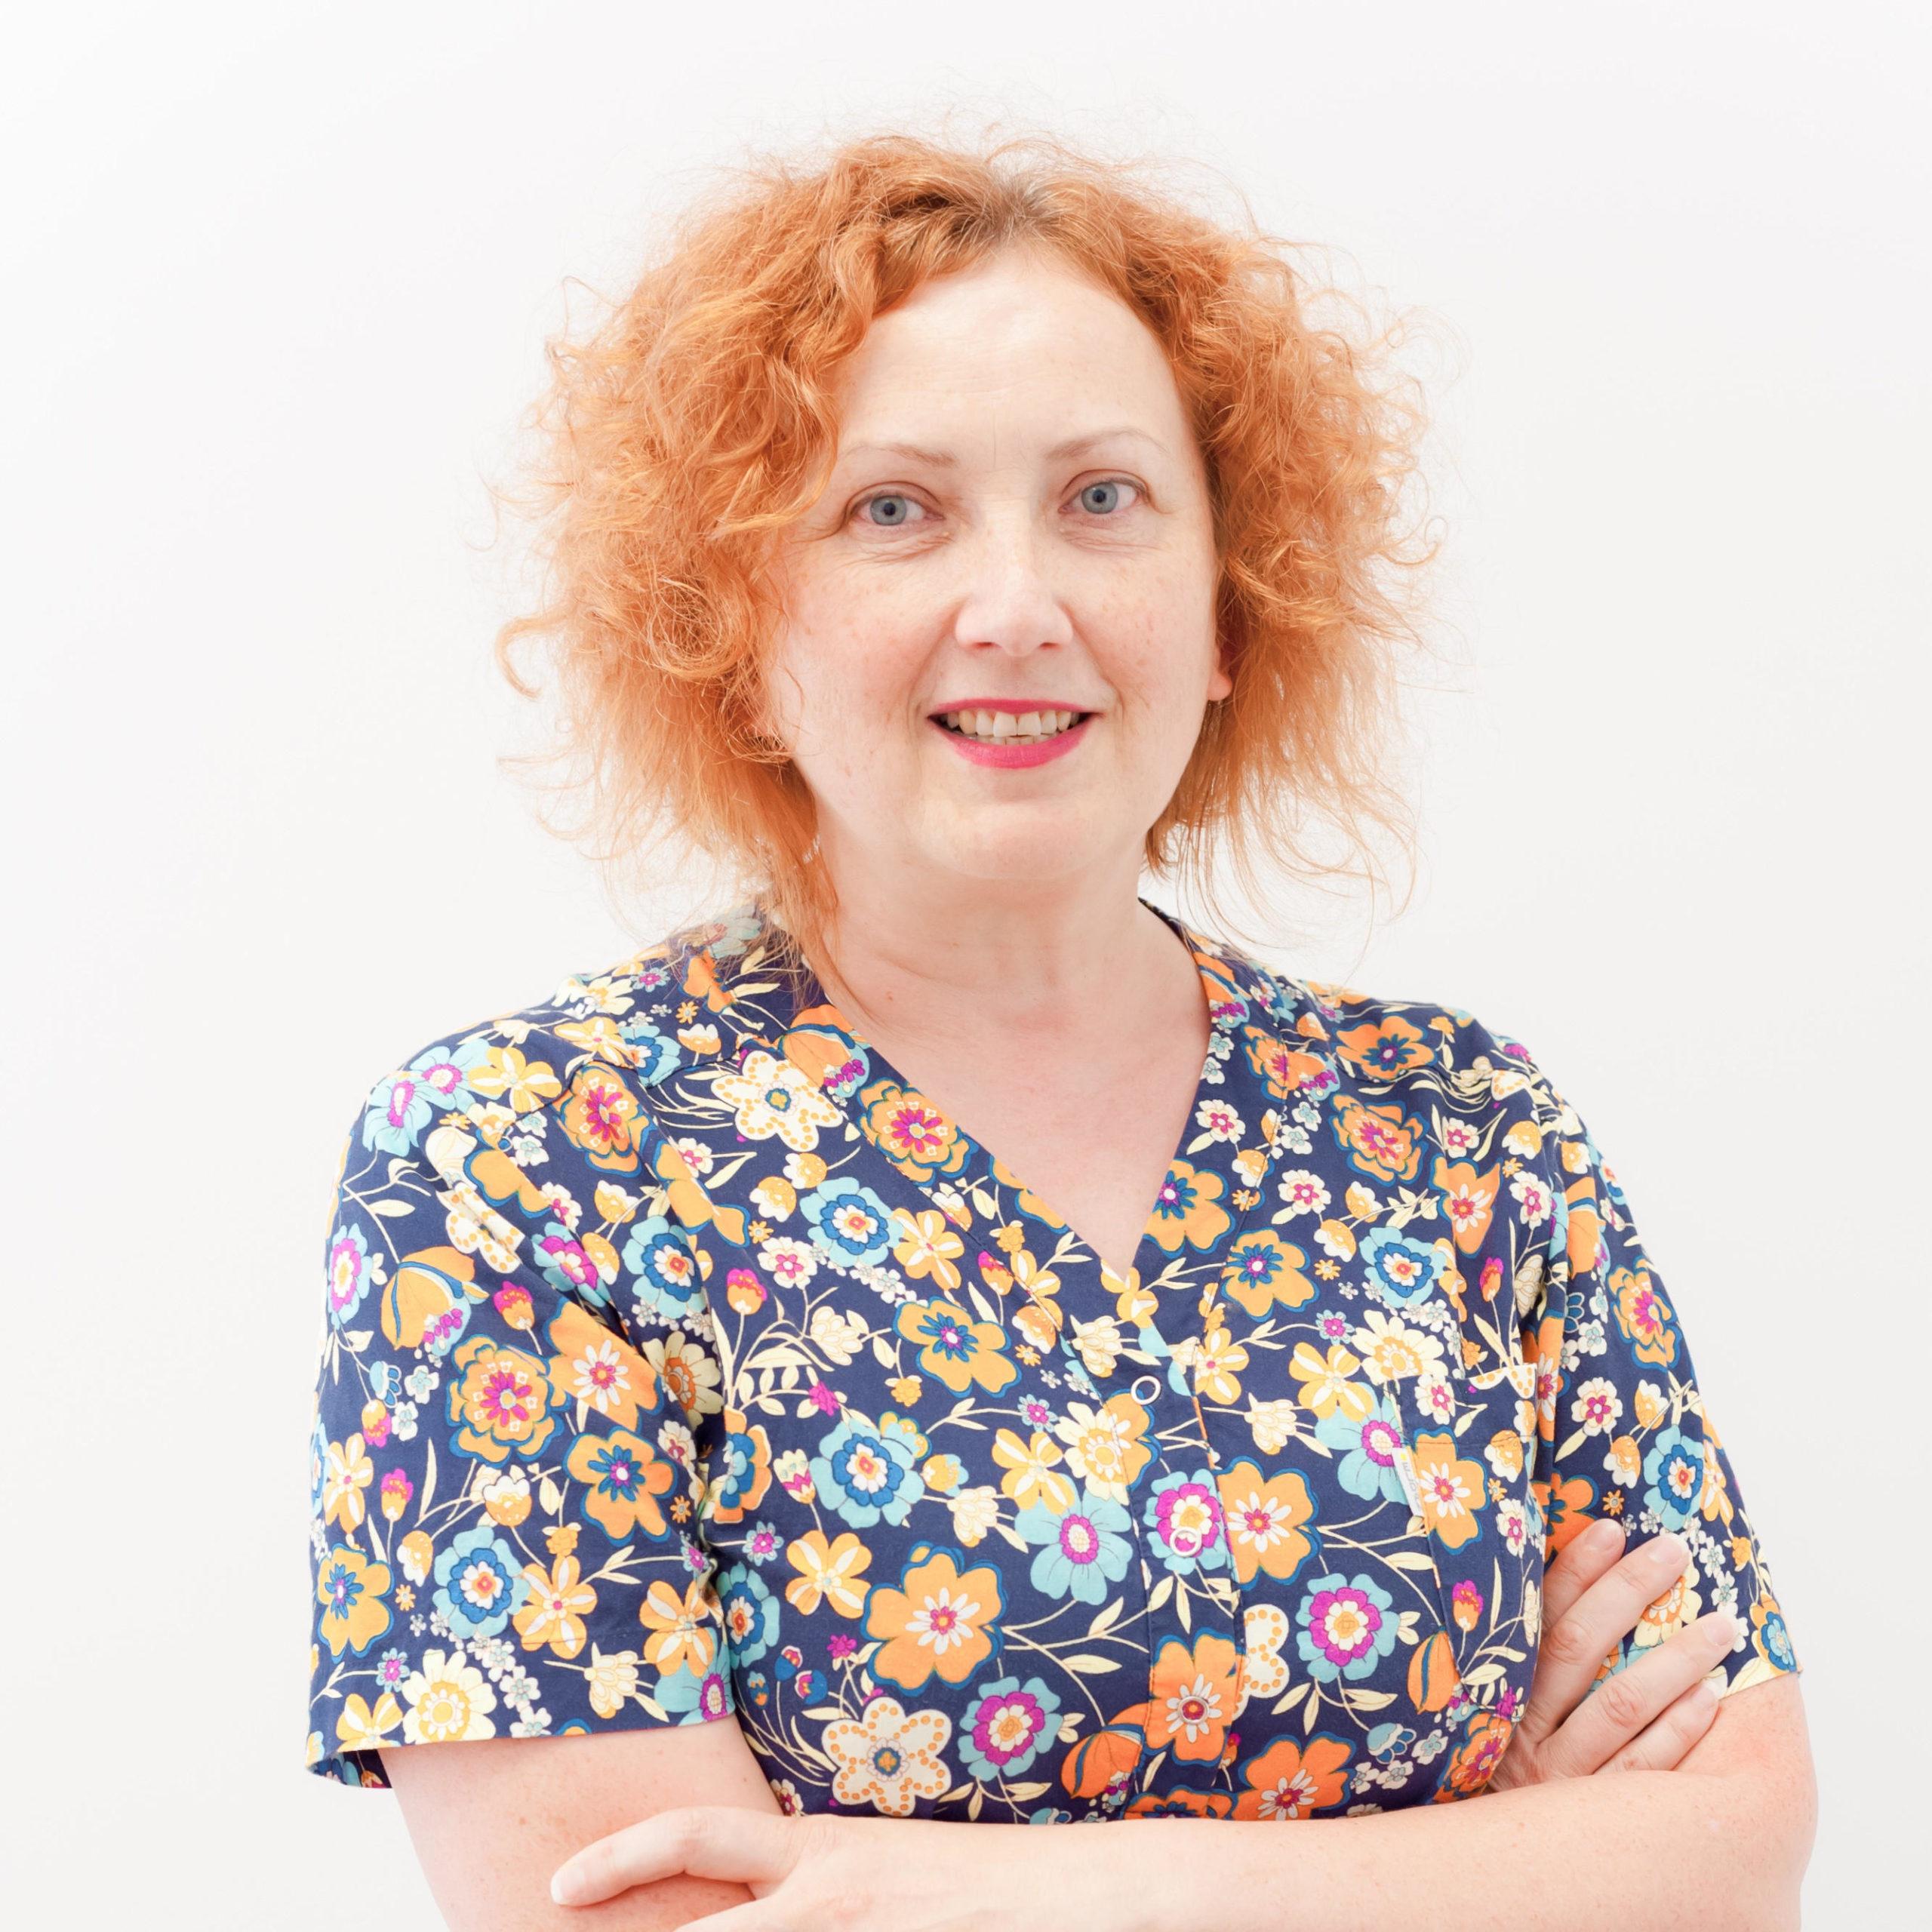 higienistka stomatologiczna Marzena Lipińska